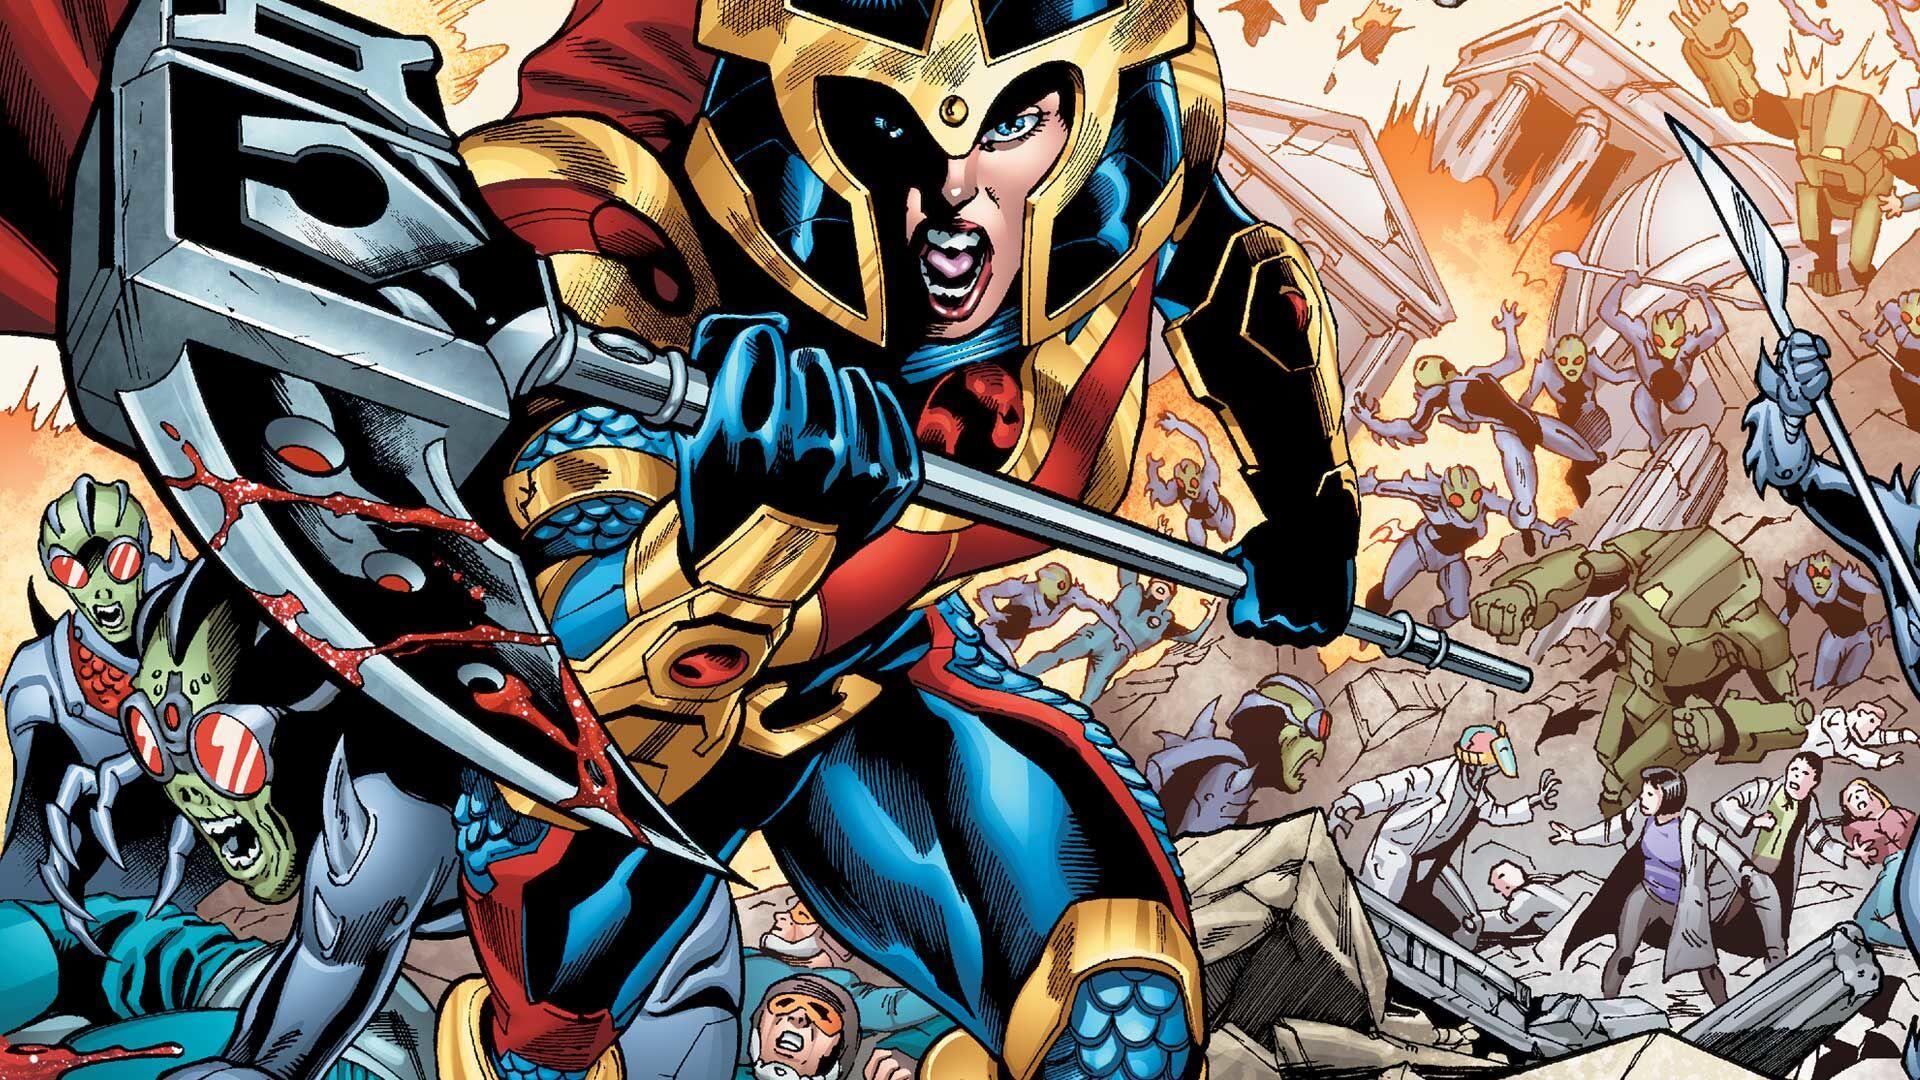 5 Hero DC Wanita yang Gak Kalah Seru Kalau Ada di AoV